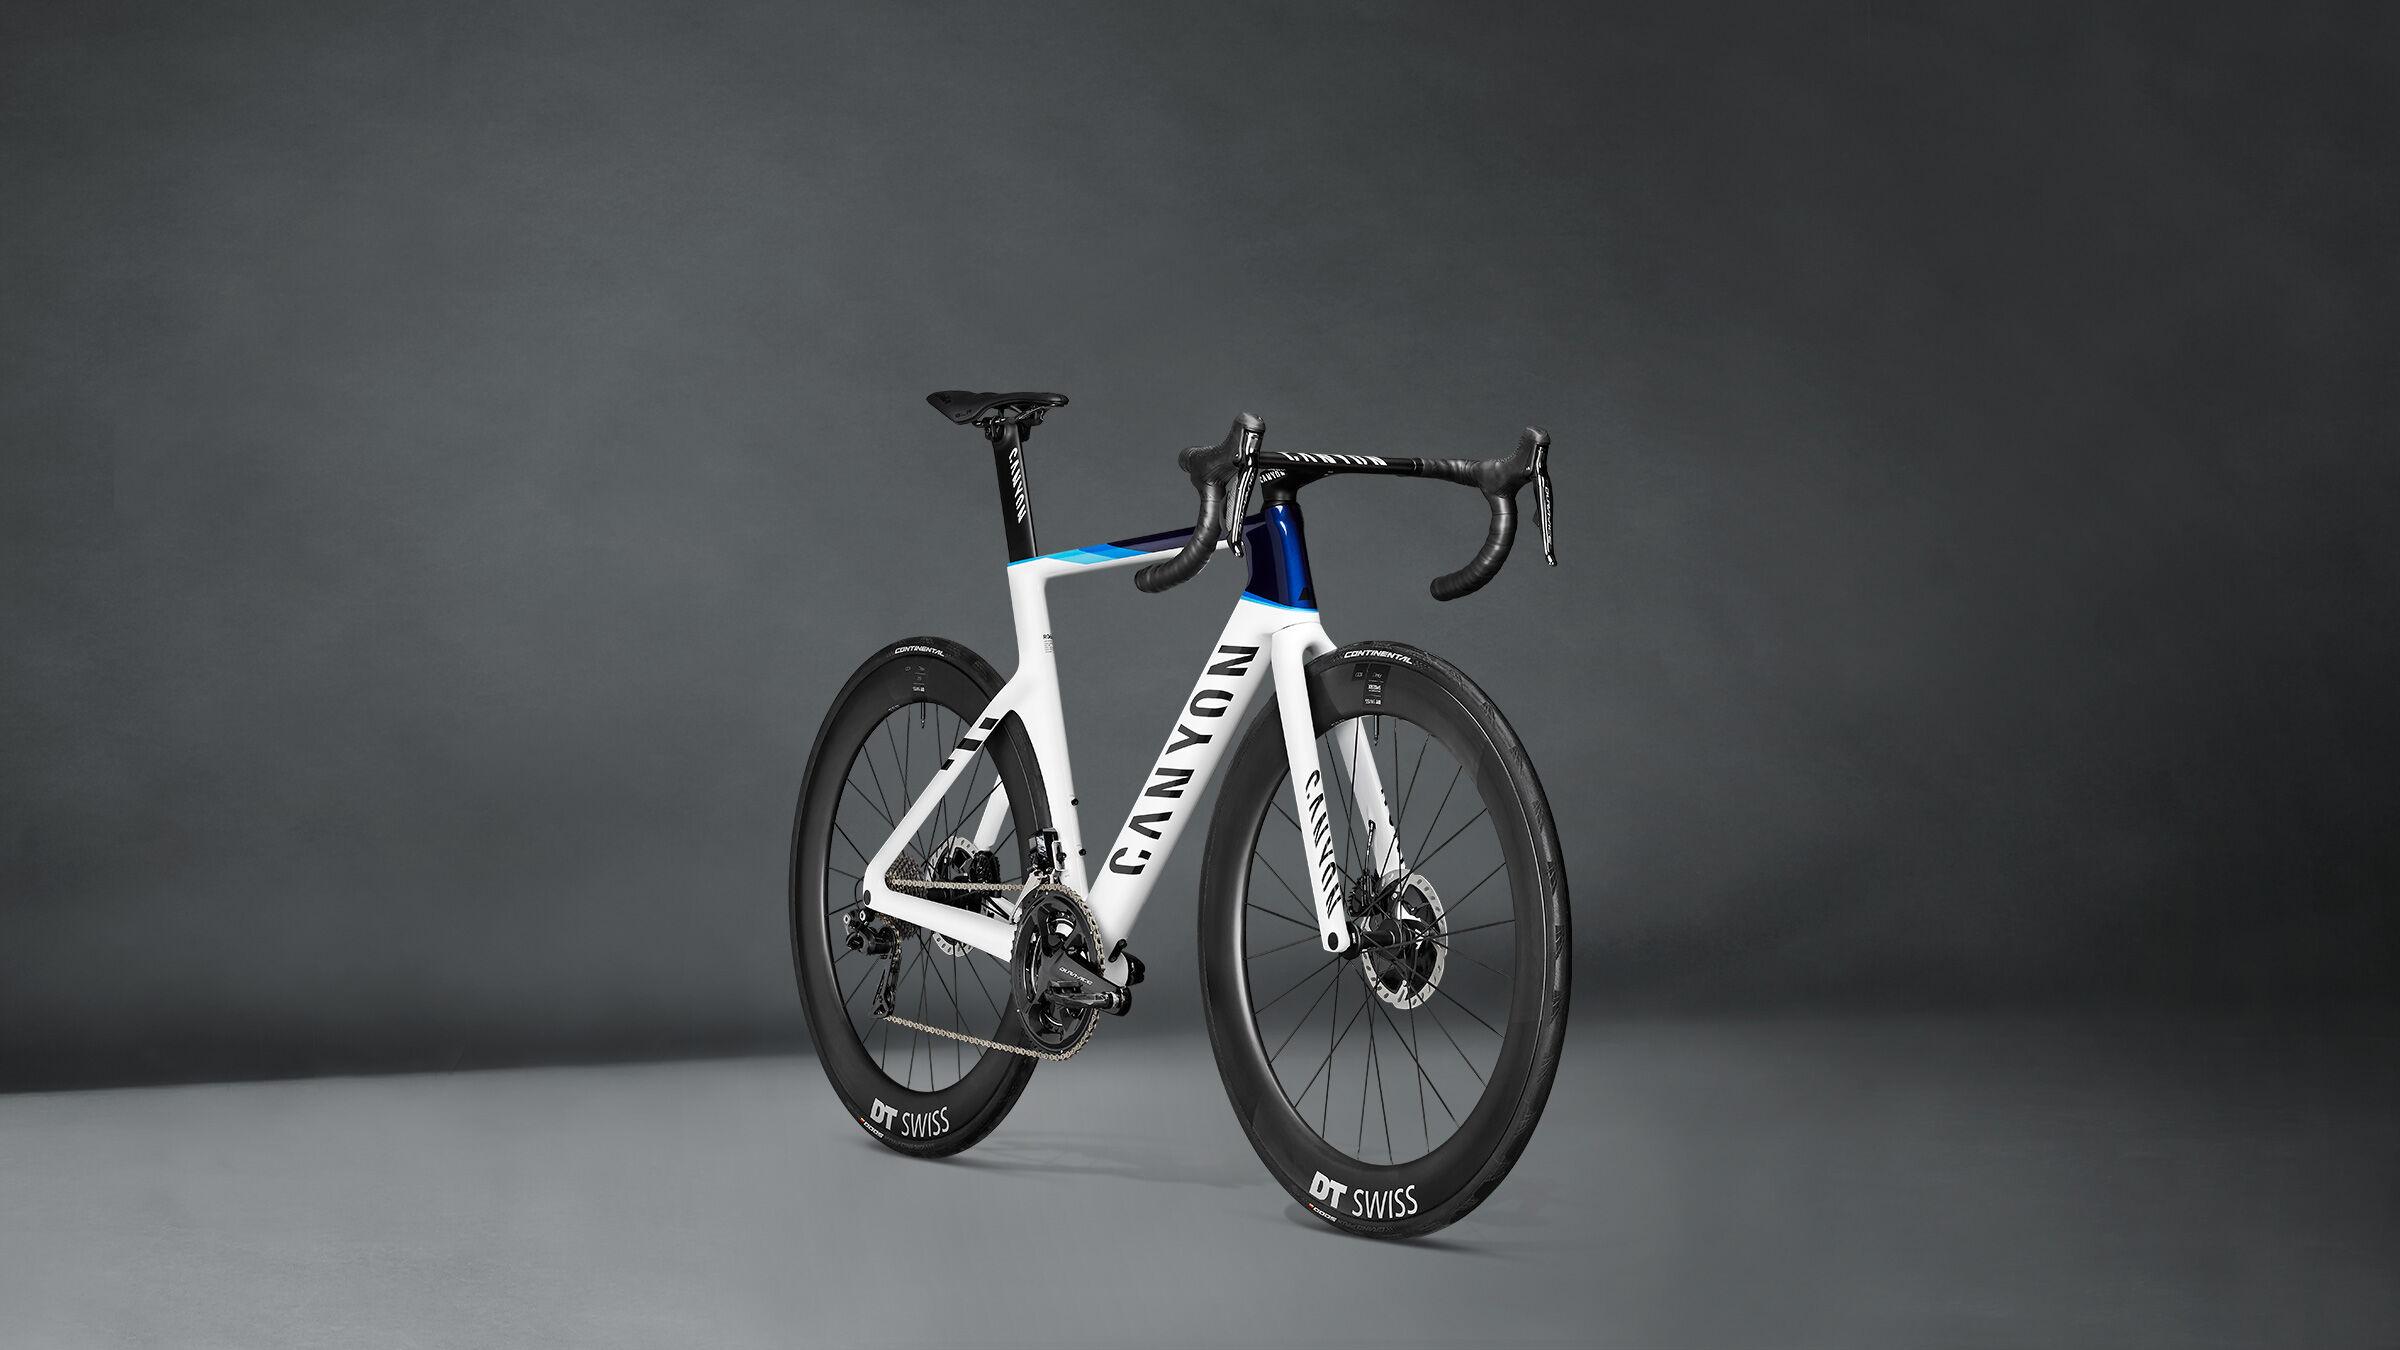 alpecin fenix cycling clothing bikes